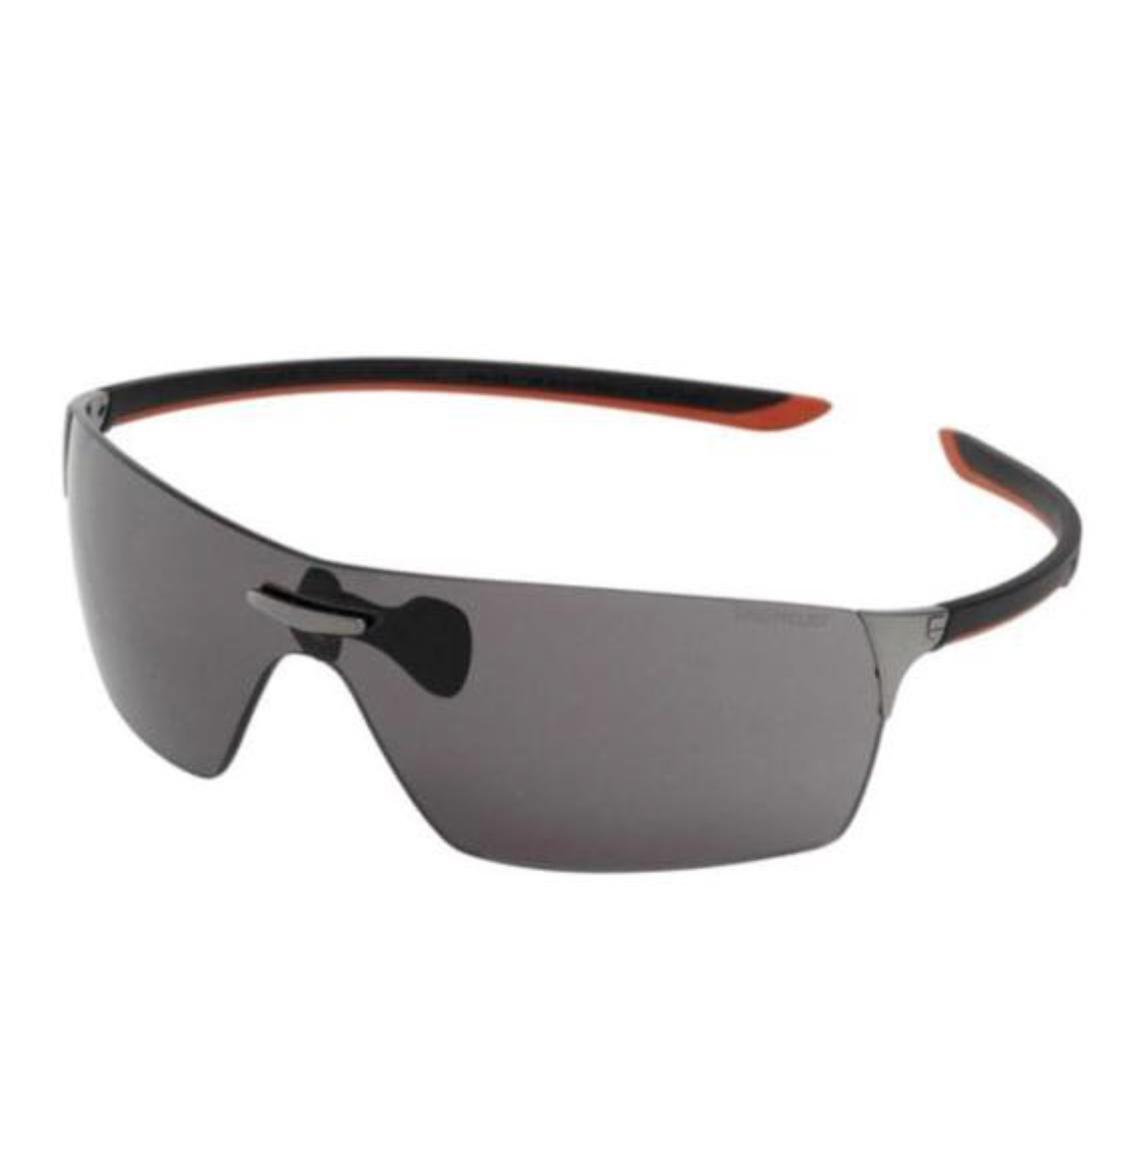 d3f67ebfb8b Singapore. Tag Heuer Reflex 5501 104 Sunglasses